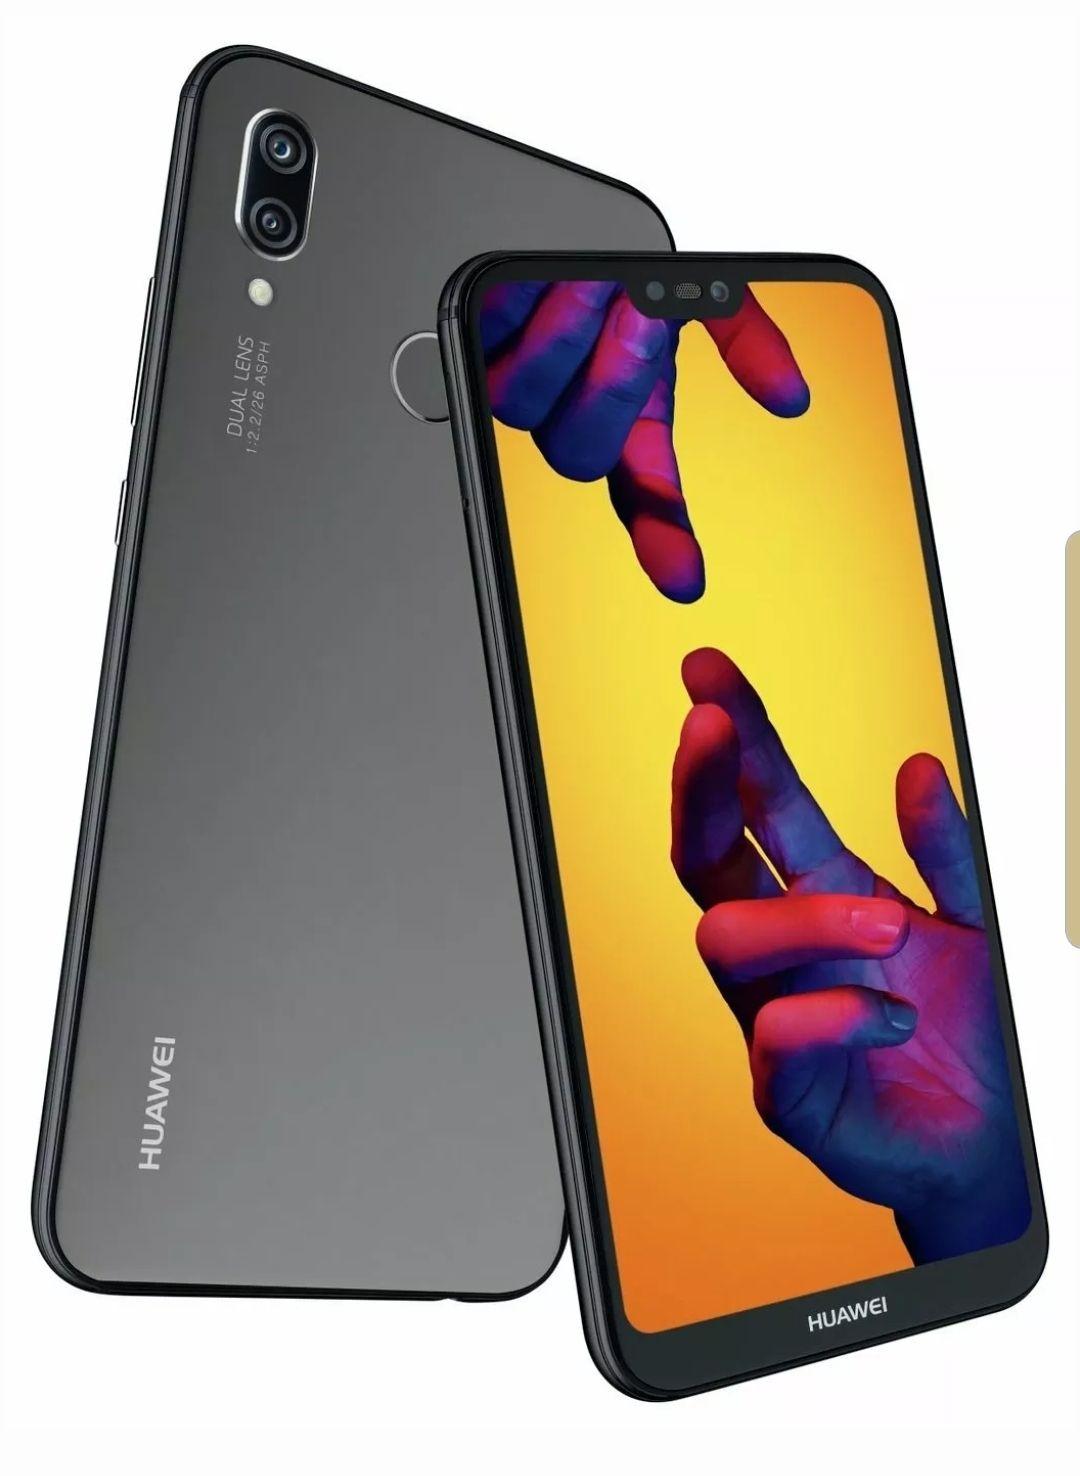 Sim Free Huawei P20 Lite 5.84 Inch 64GB Mobile Phone (Refurbished) - Black @ Argos Ebay store - £121.99